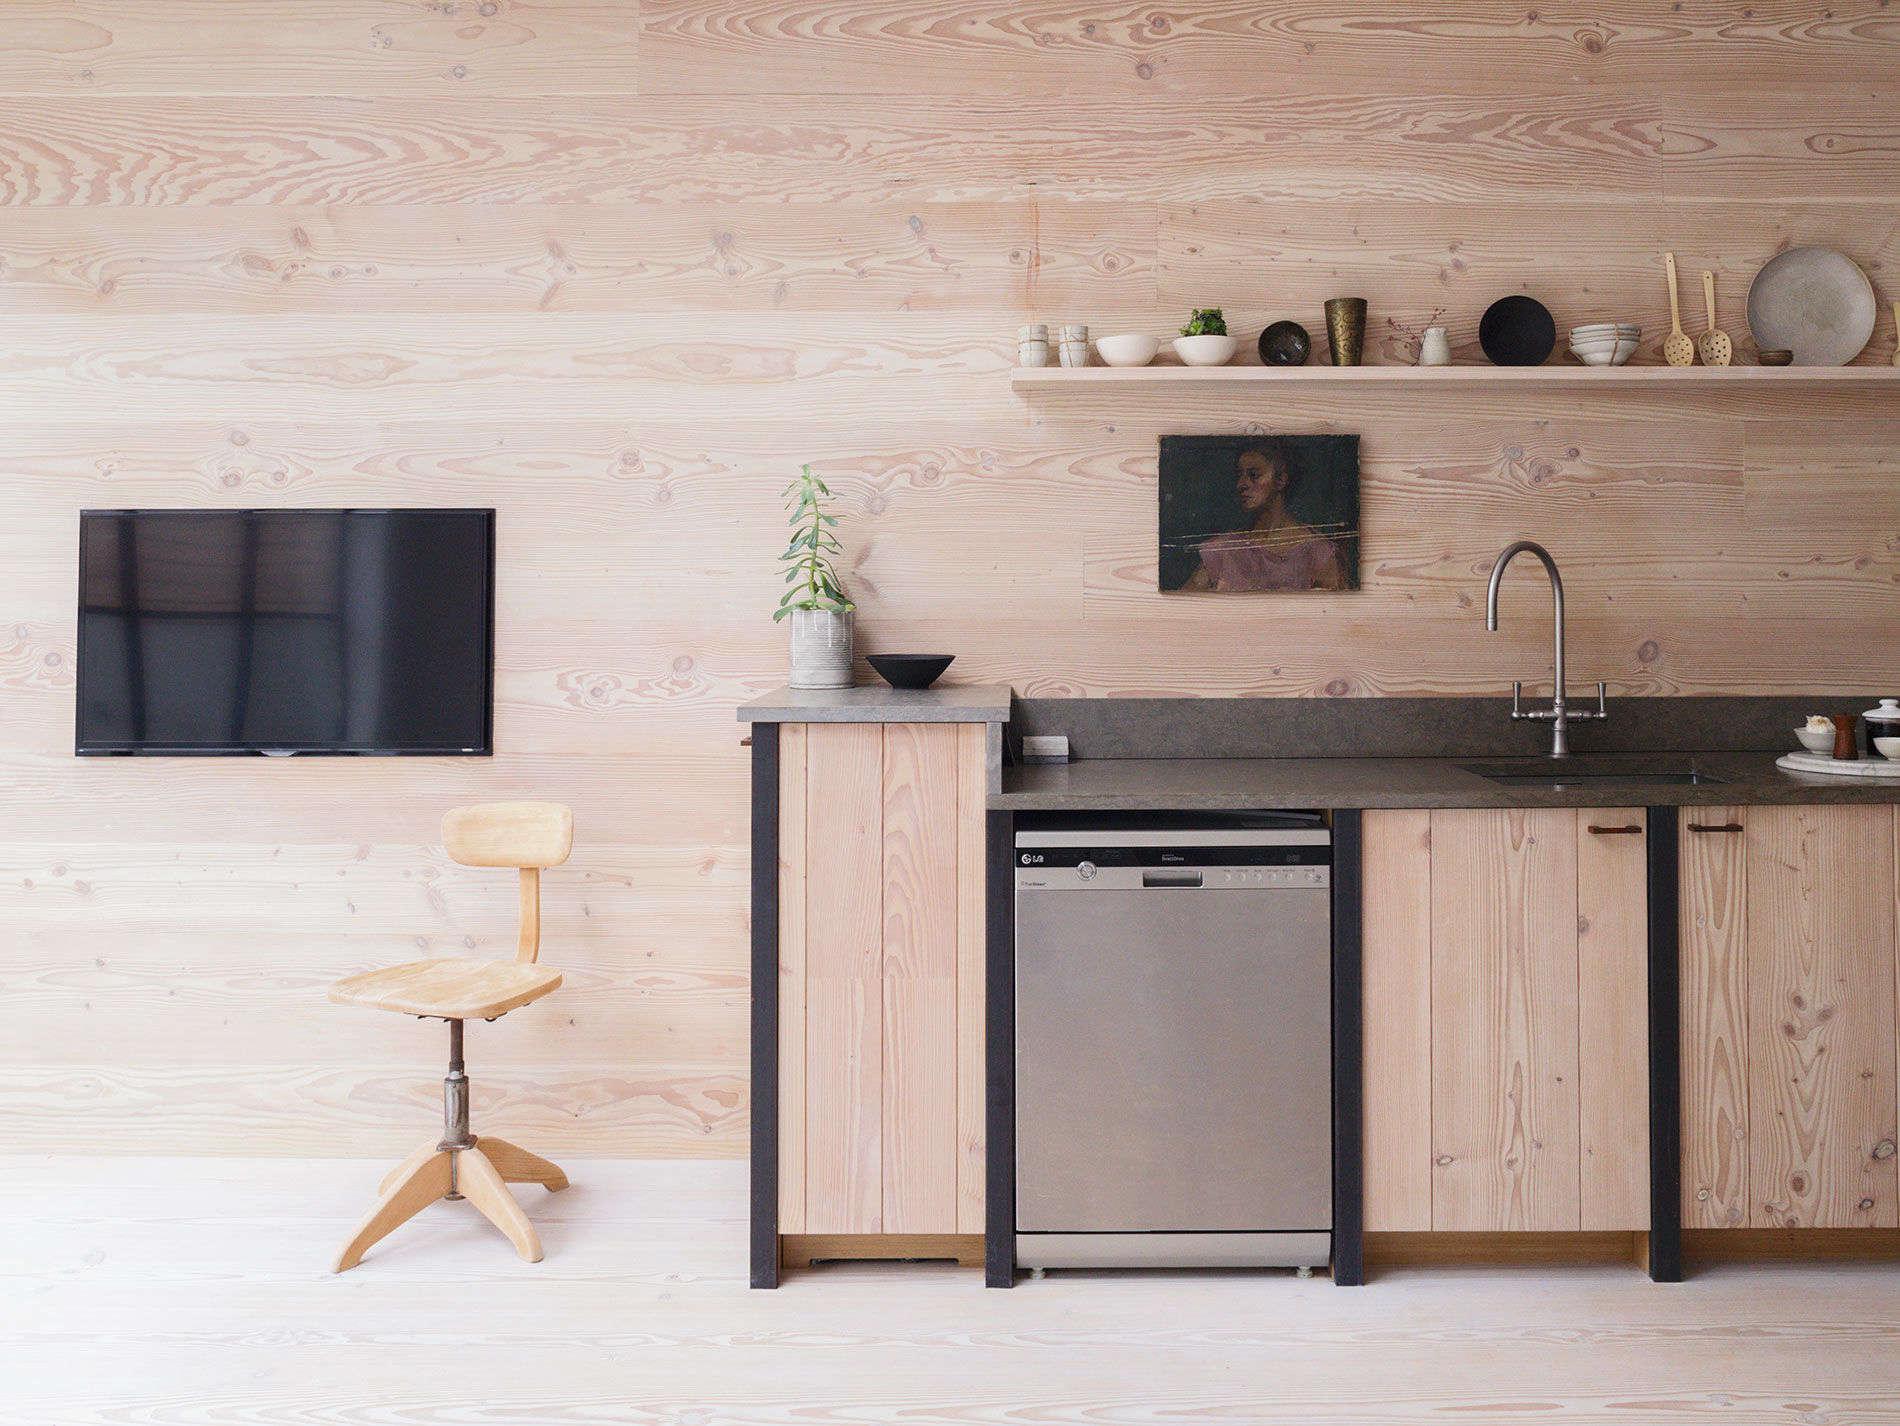 Studio Ore Fulham Rory Gardiner Remodelista Kitchen